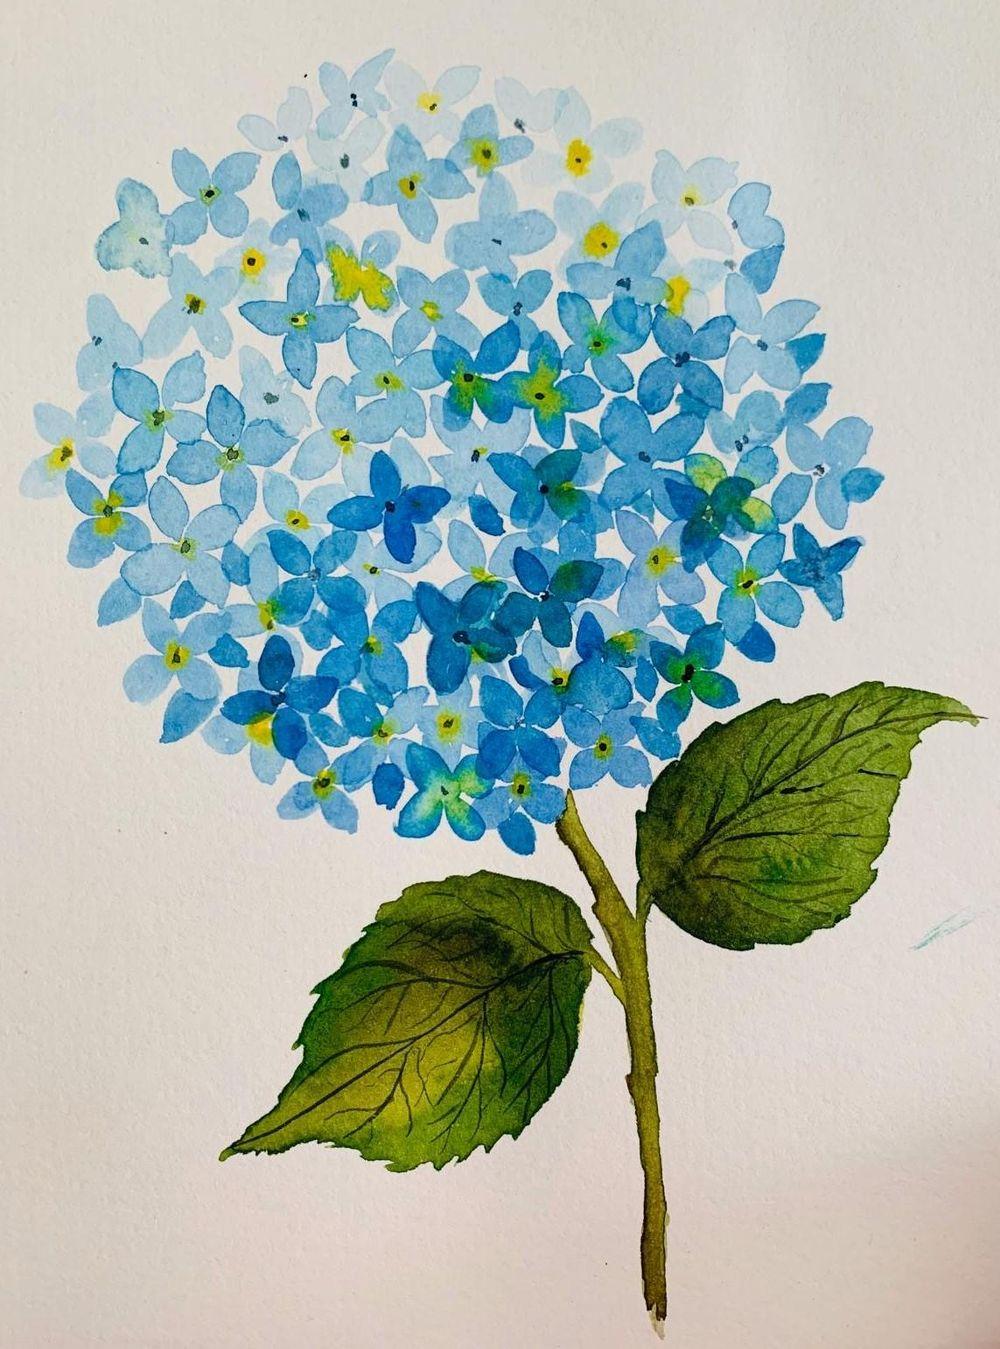 Botanical - image 1 - student project